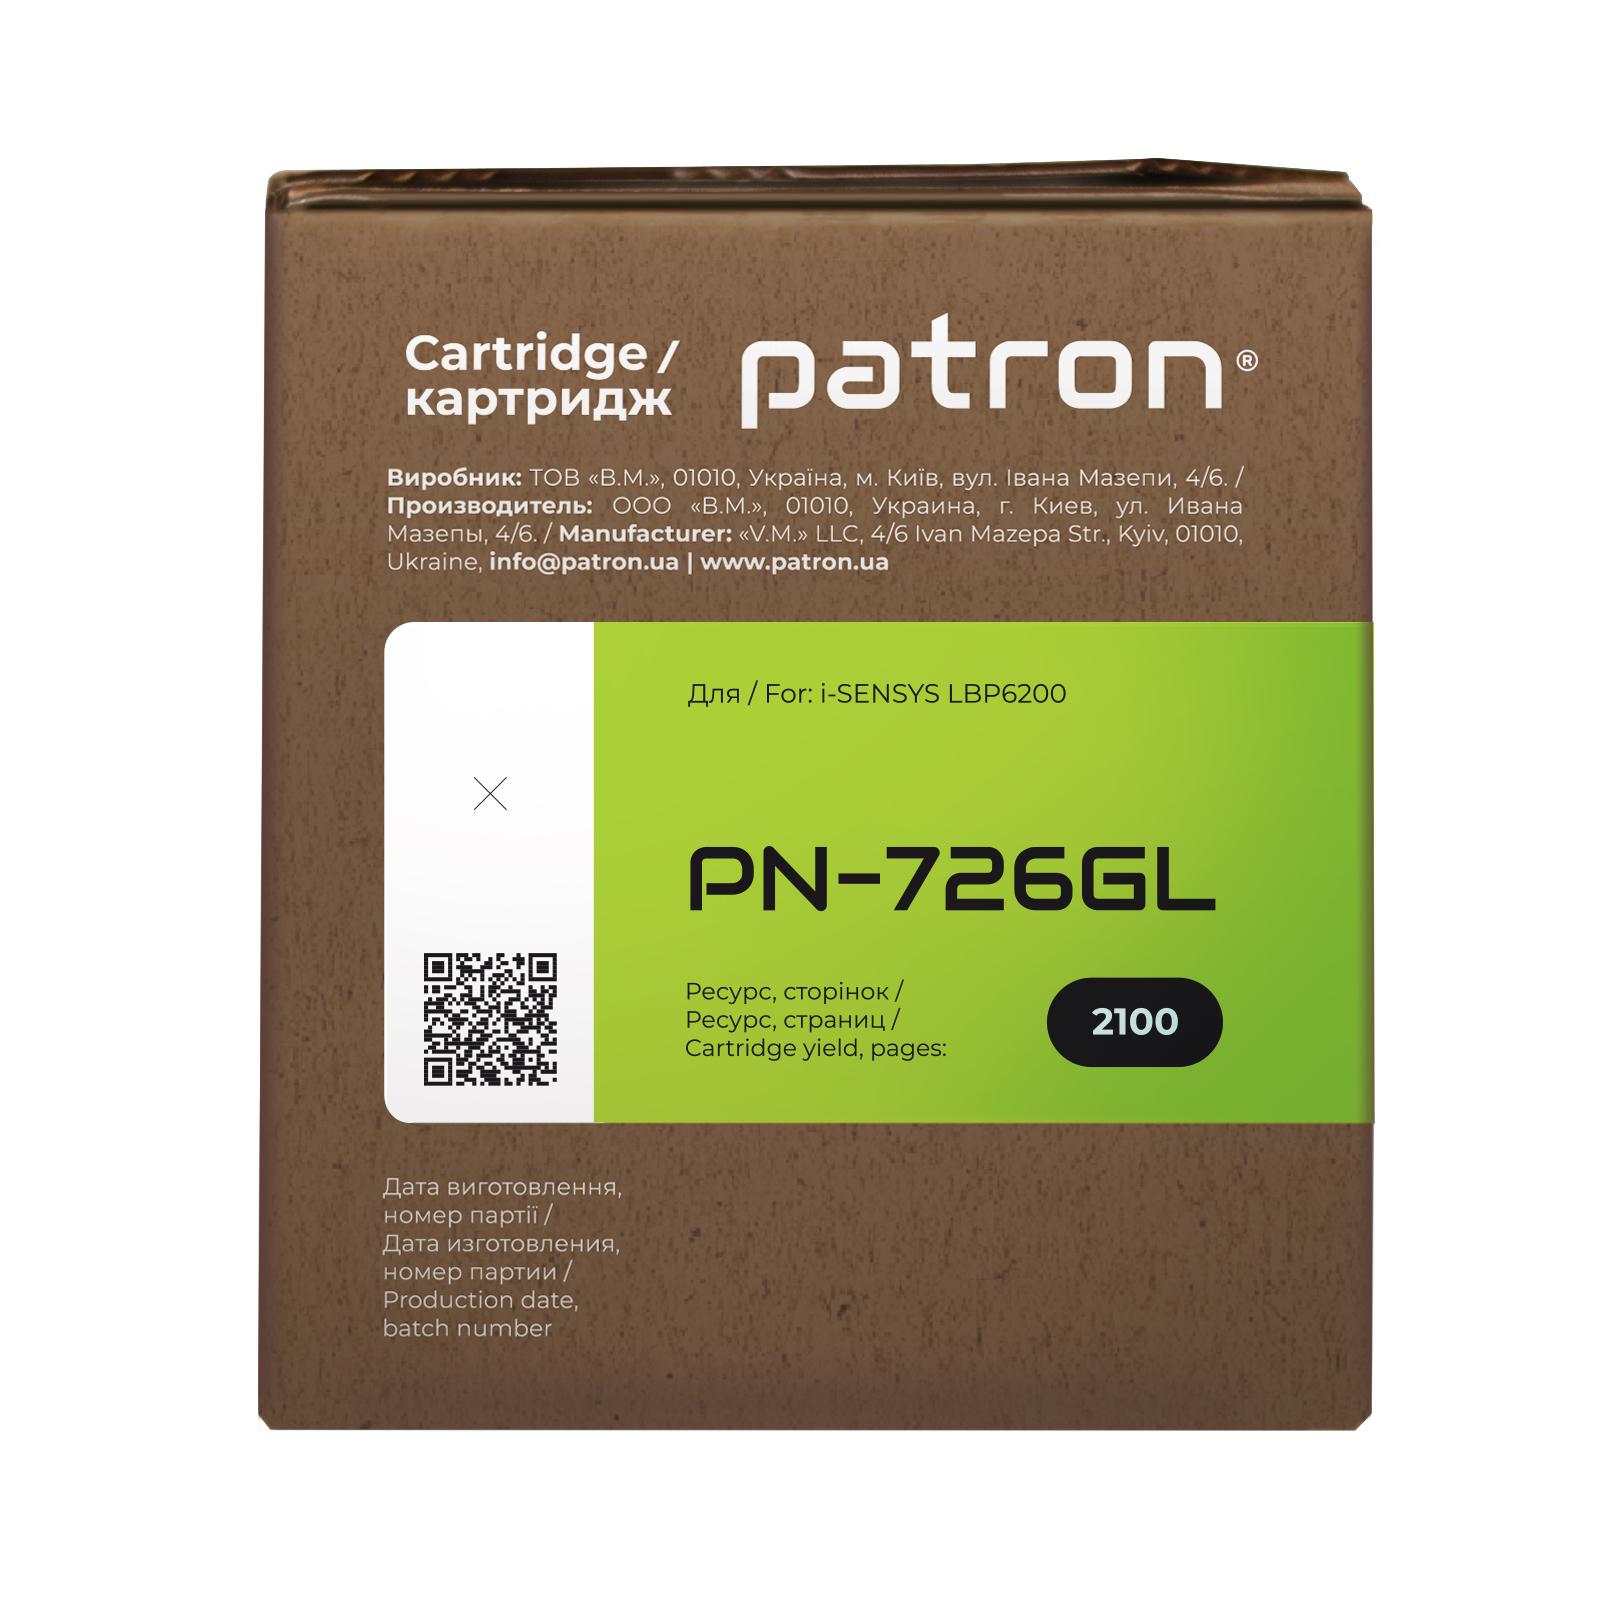 Картридж Patron CANON 726 GREEN Label (PN-726GL) изображение 3